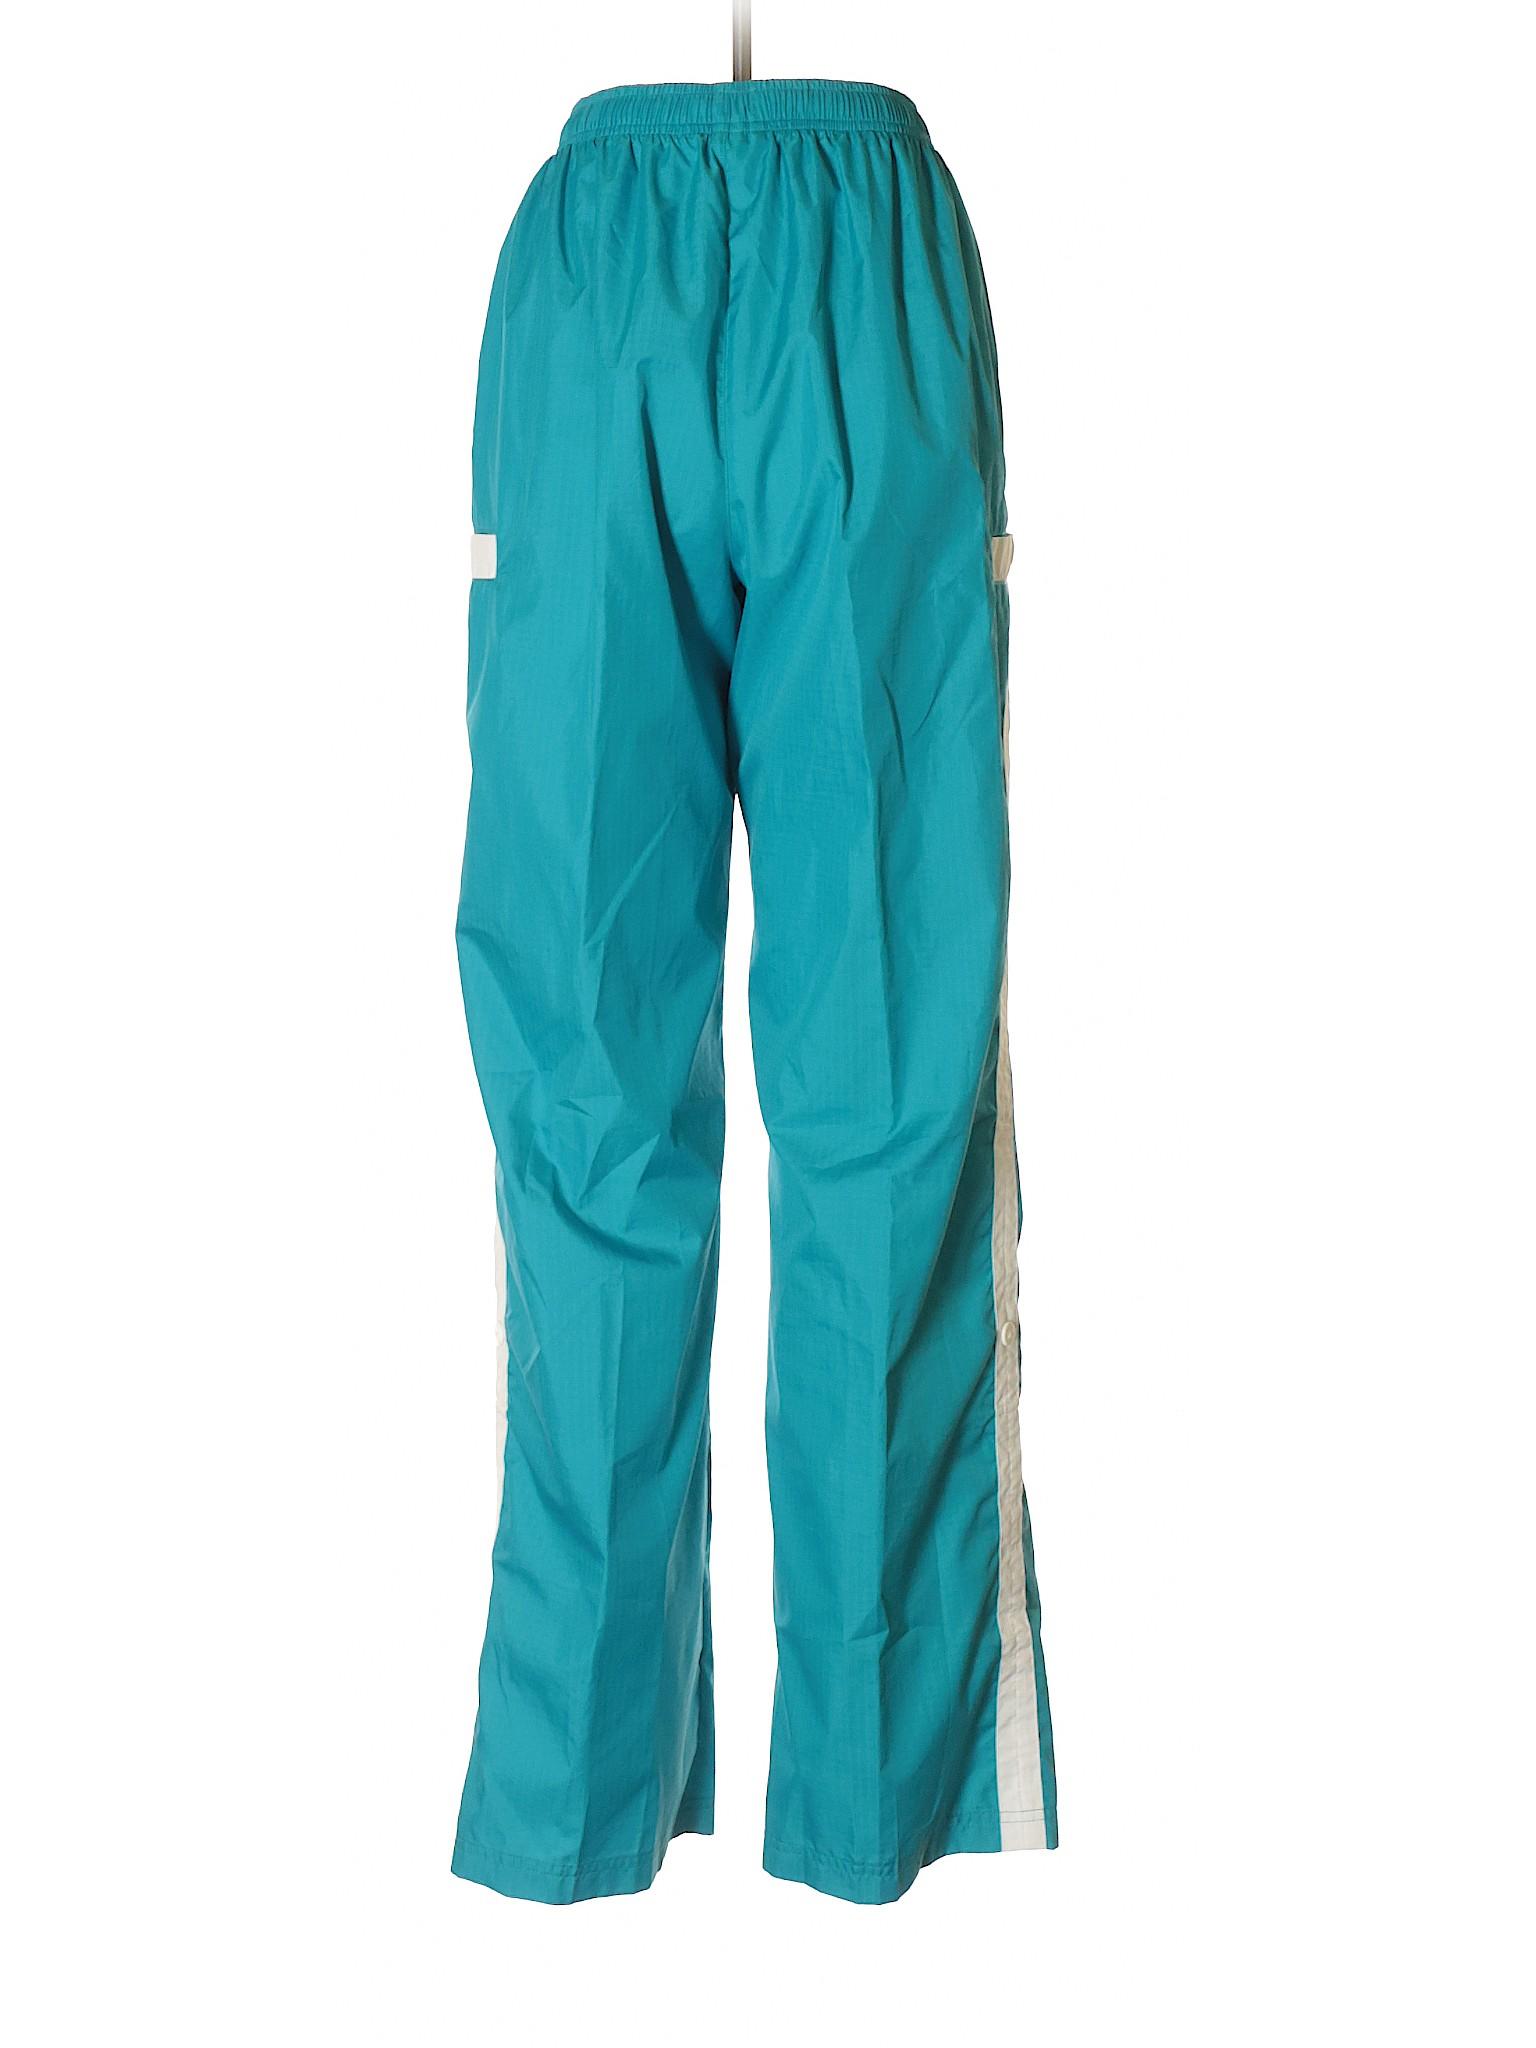 Active Nike Leisure Pants Pants Active winter winter winter Leisure Nike Leisure 17q1wxFza